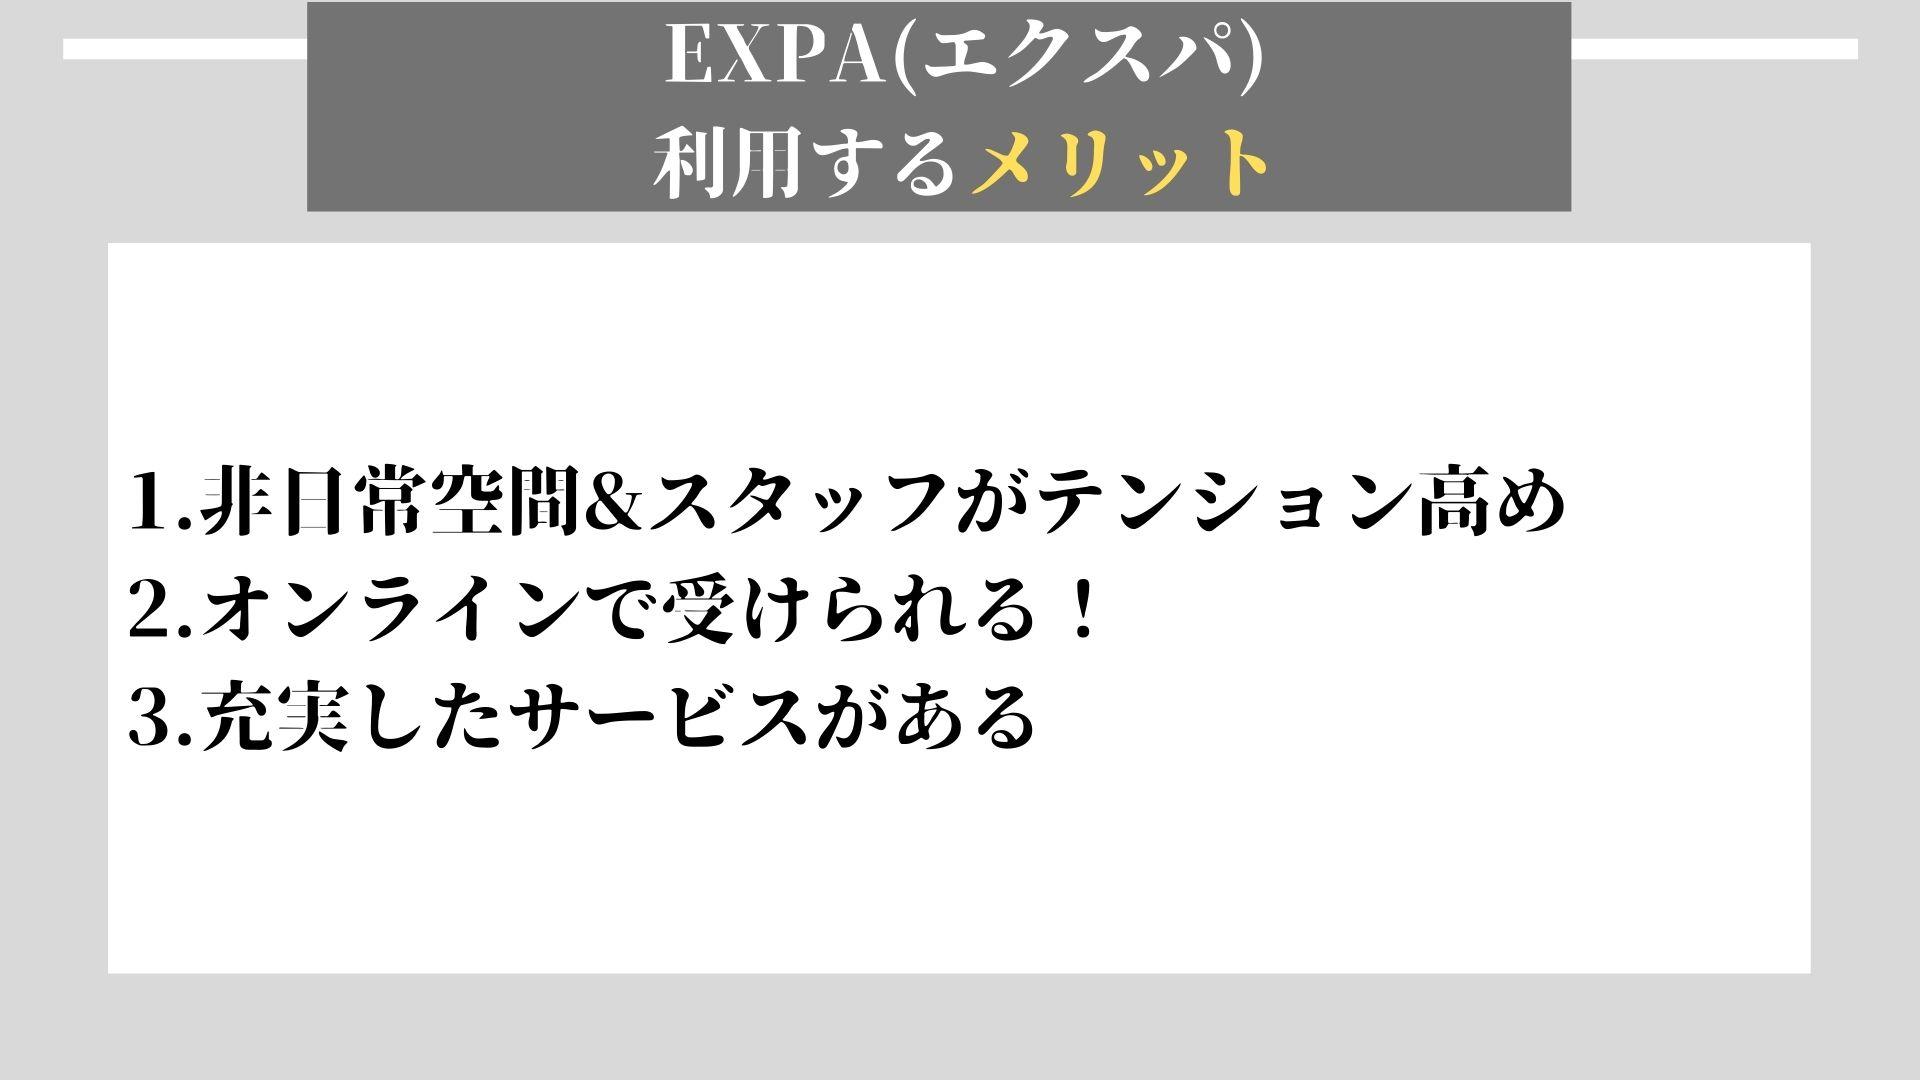 EXPA メリット